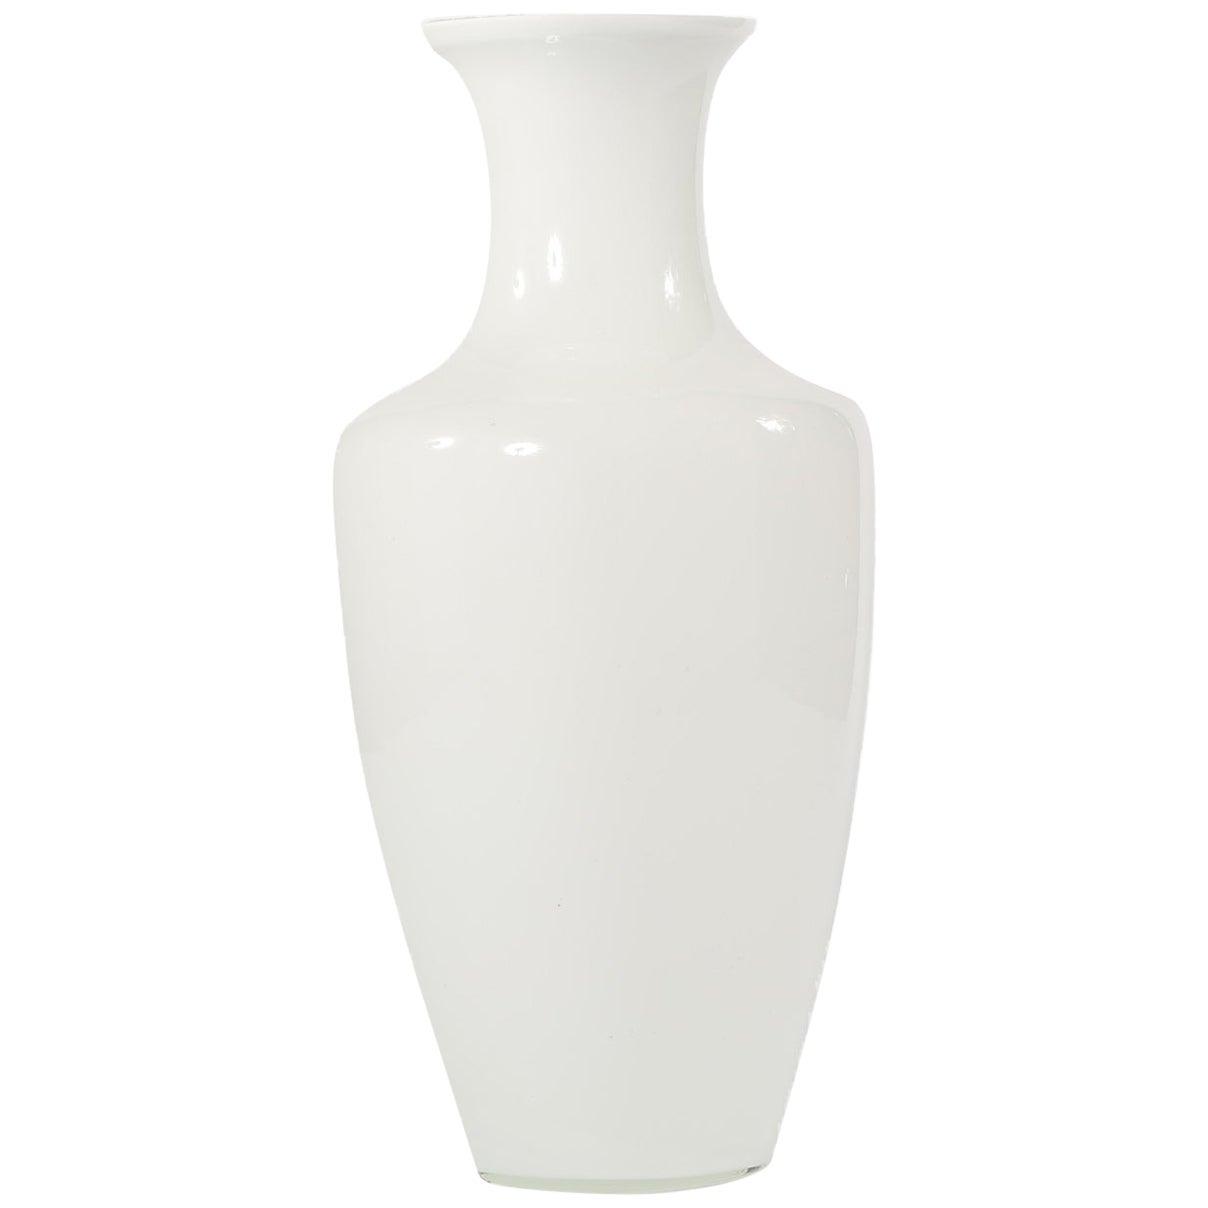 Large 20th Century Glass Floor Vase / Umbrella Stand